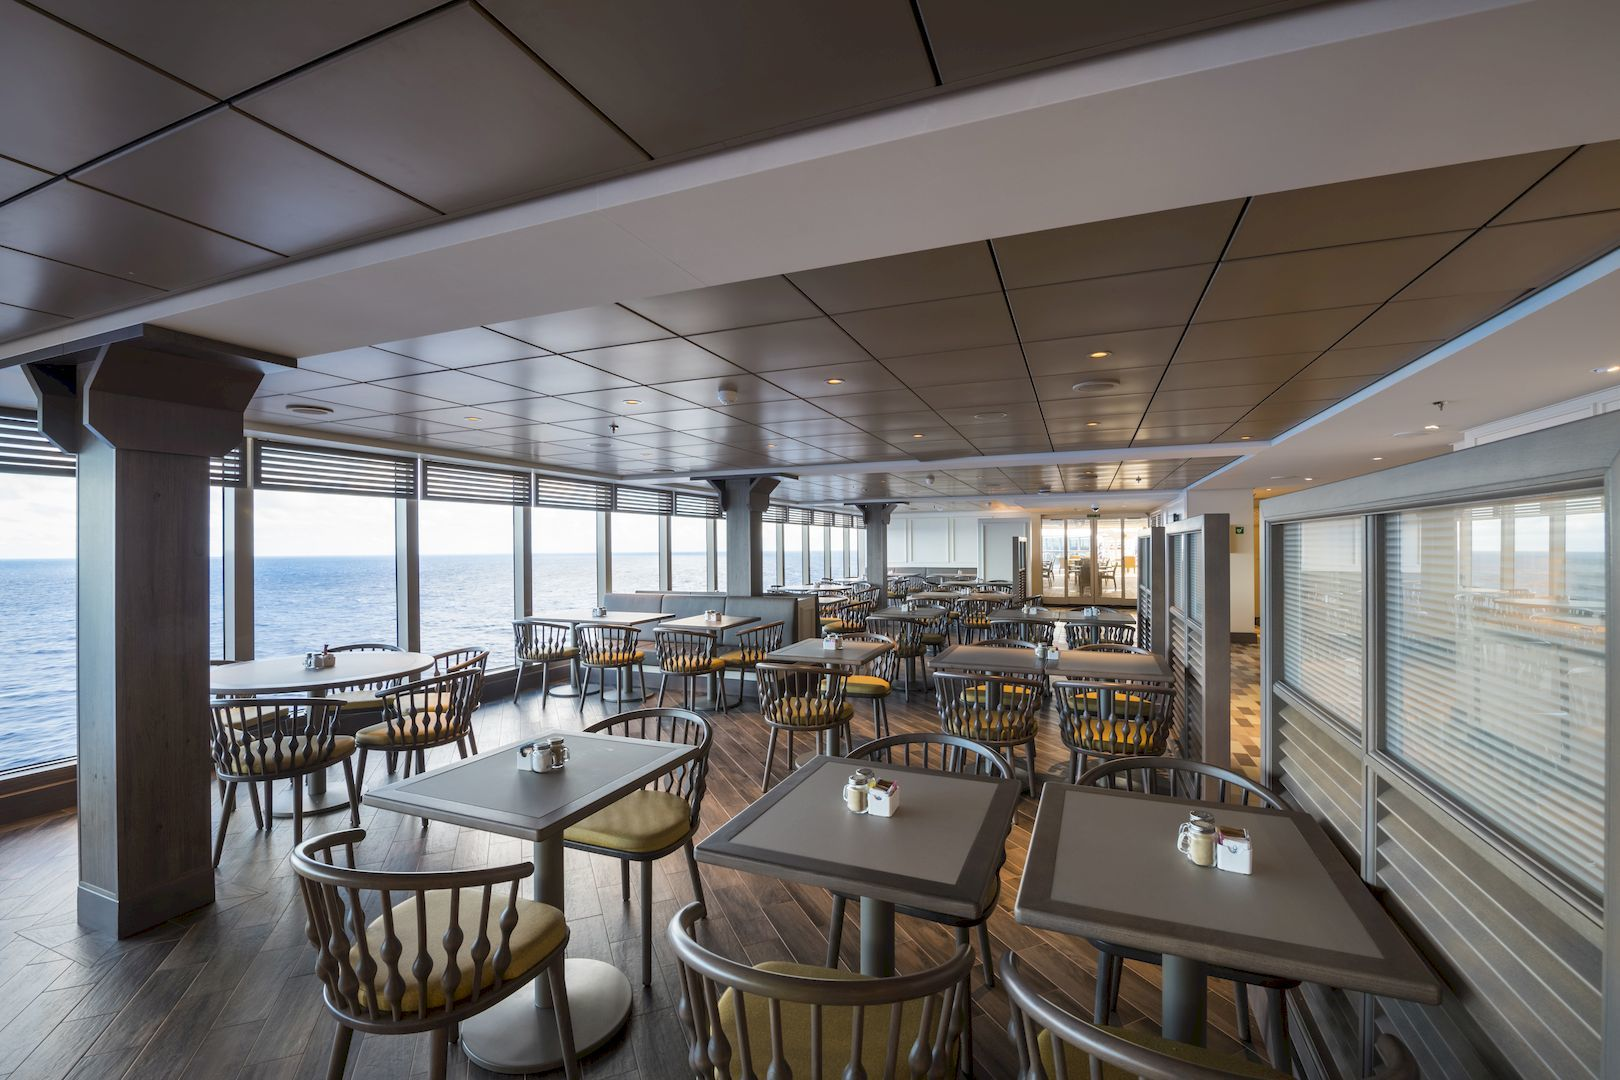 MSC Seaside | Cruiseships | Cruiseway